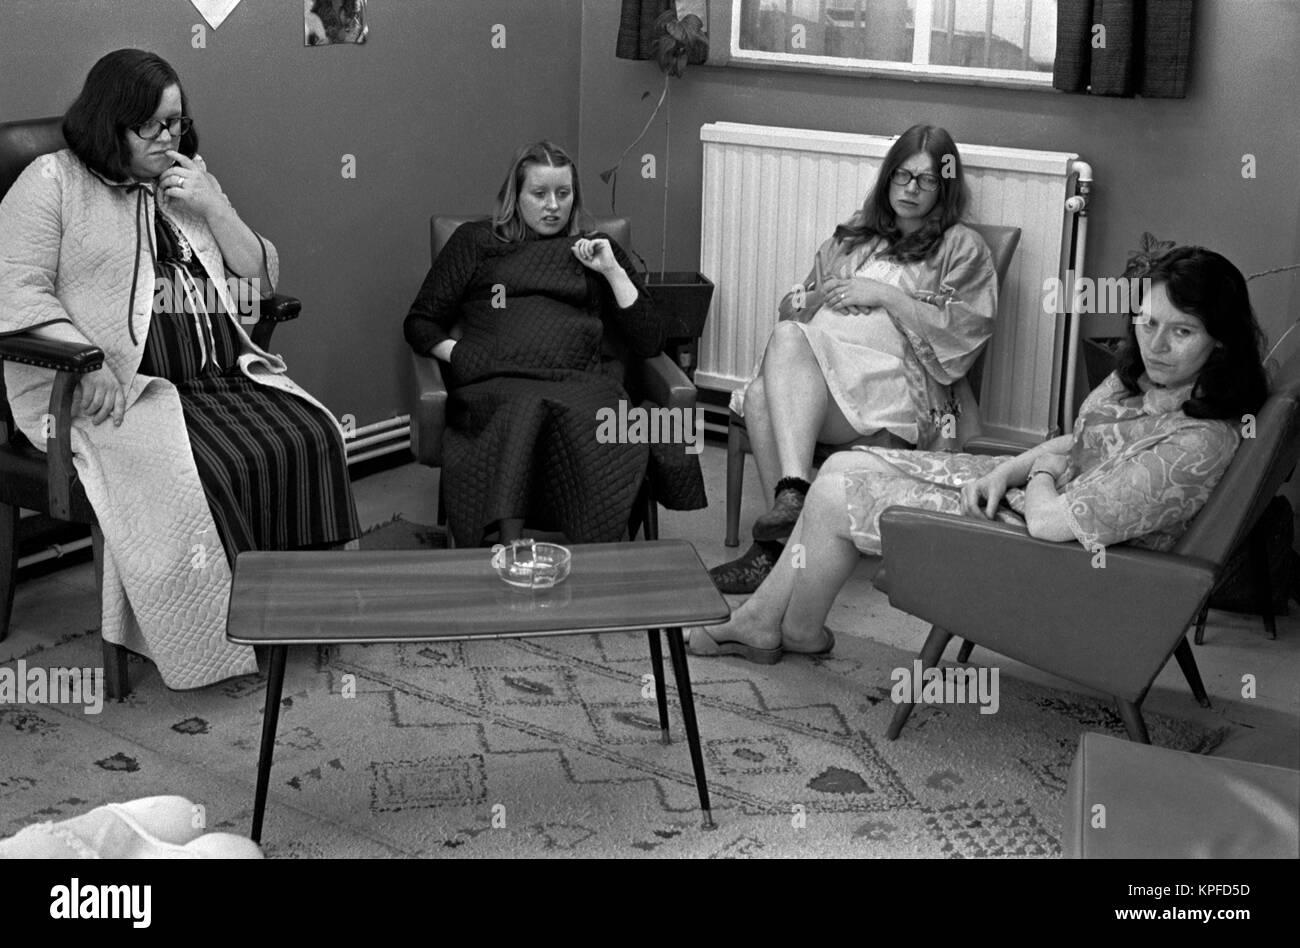 Charing Cross Hospital London 1970s womens ward watching television 70s England  HOMER SYKES - Stock Image